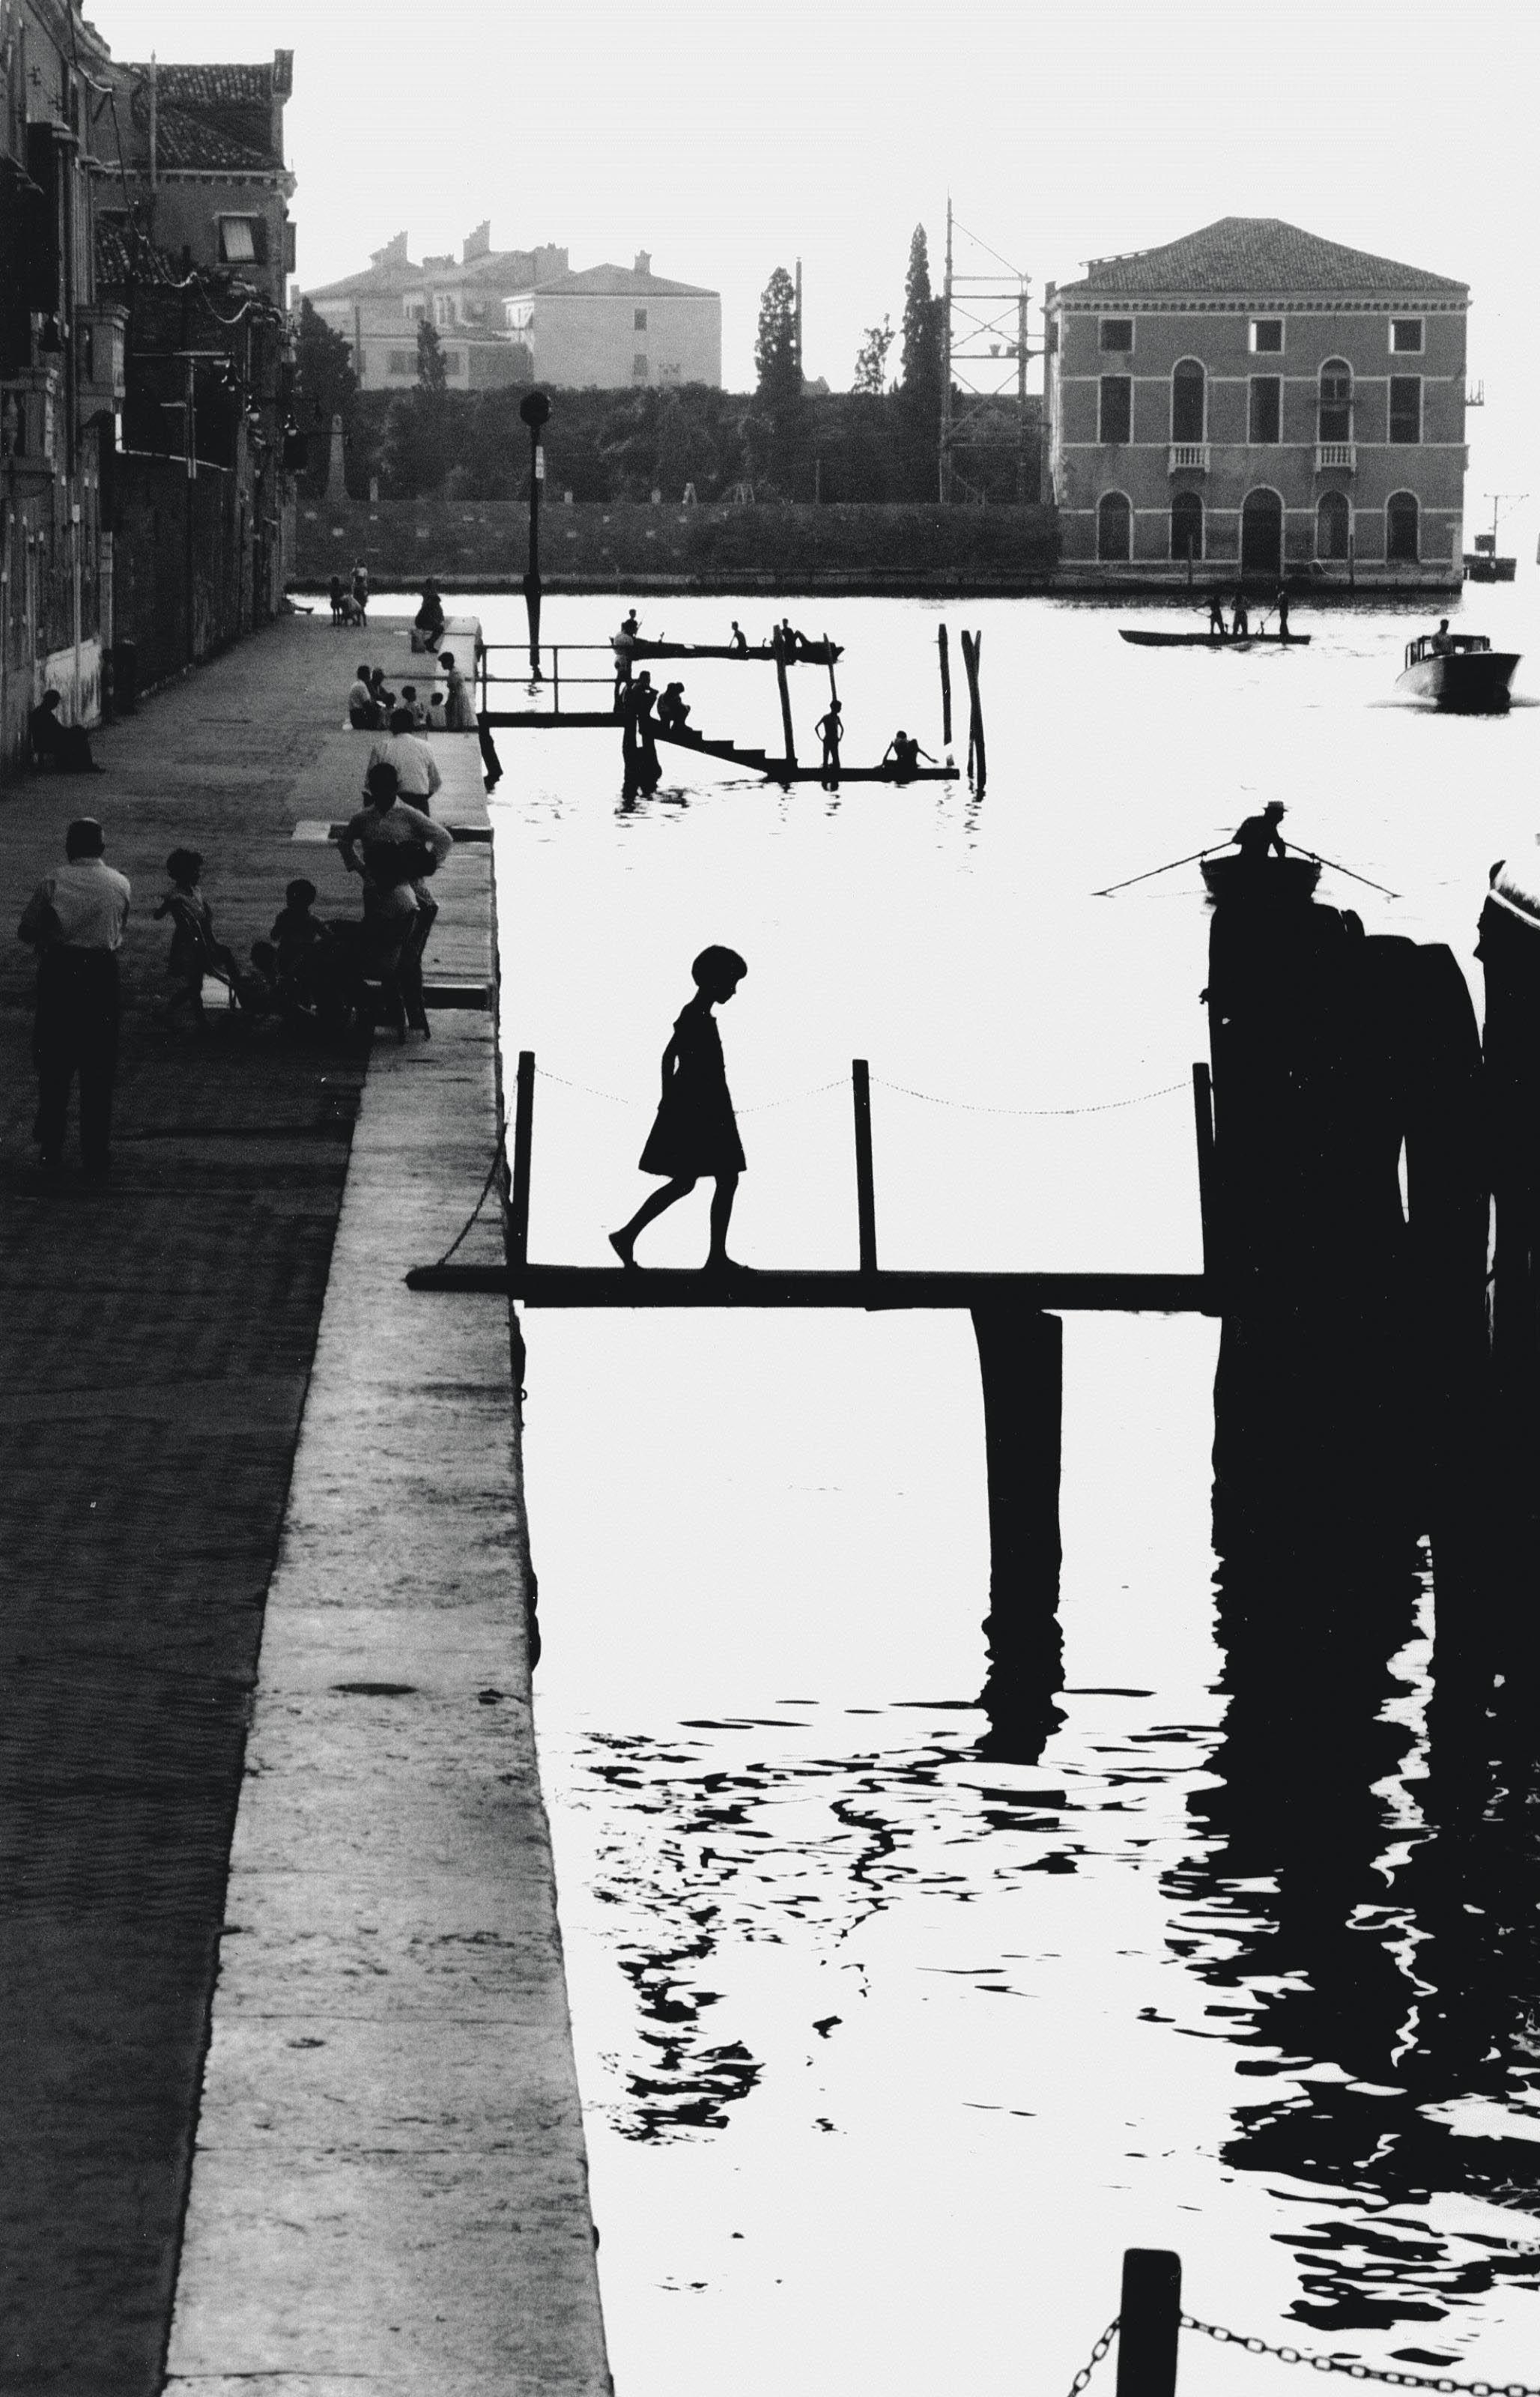 Fondamenta nuove, Venice, 1959